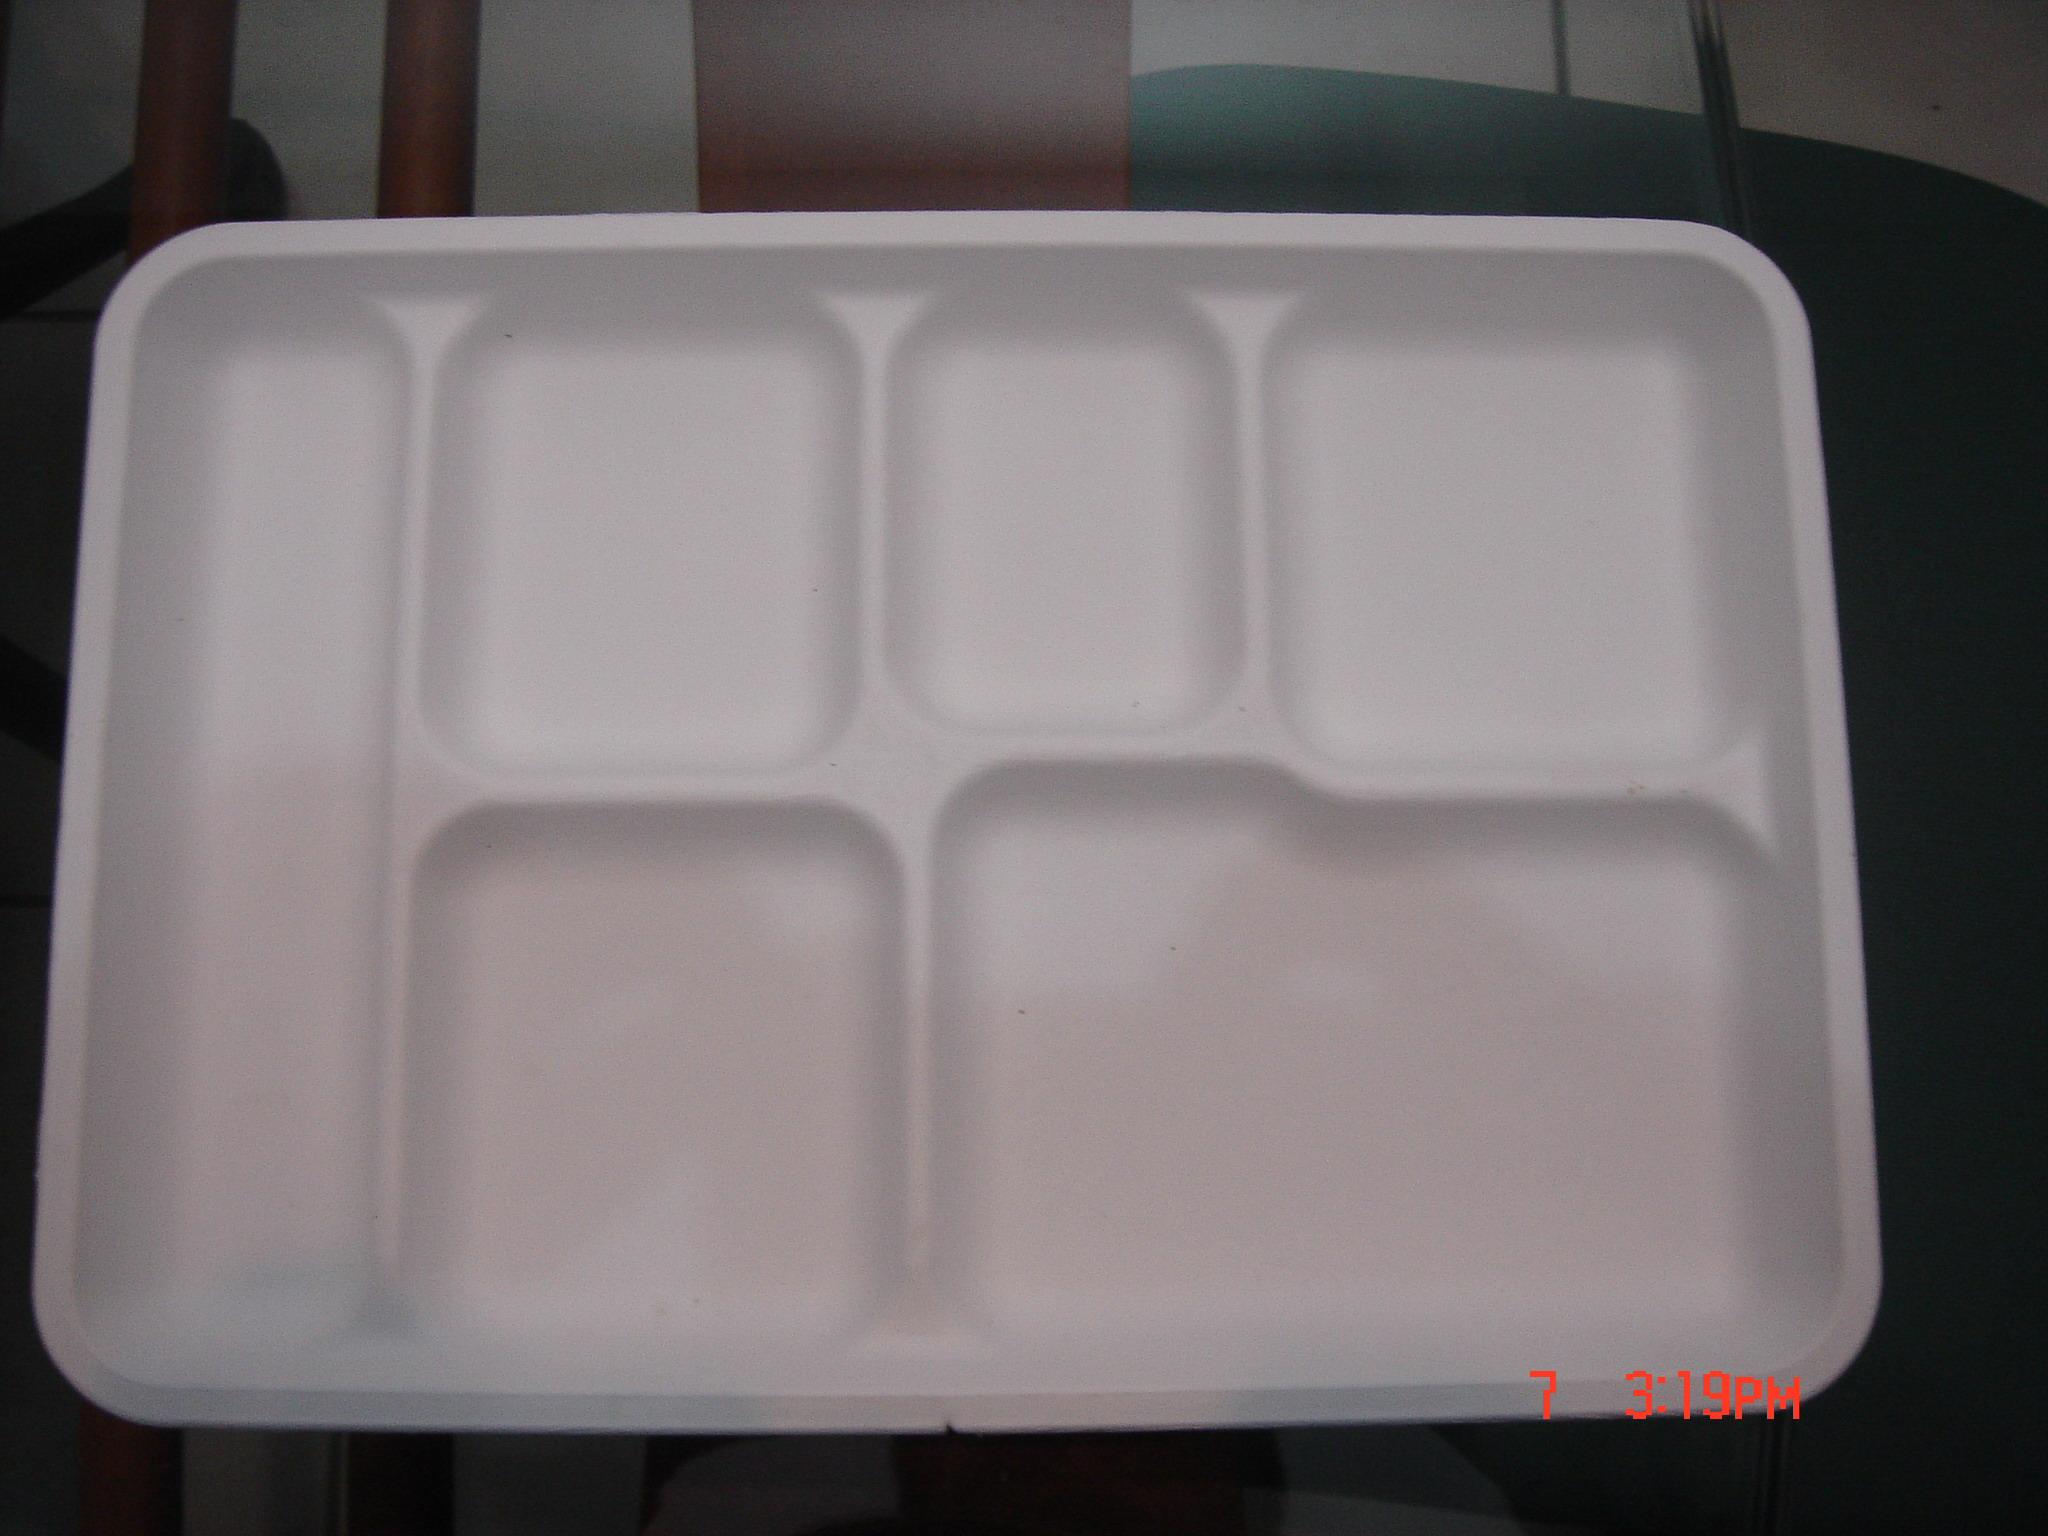 Pulp Molding Food Wares